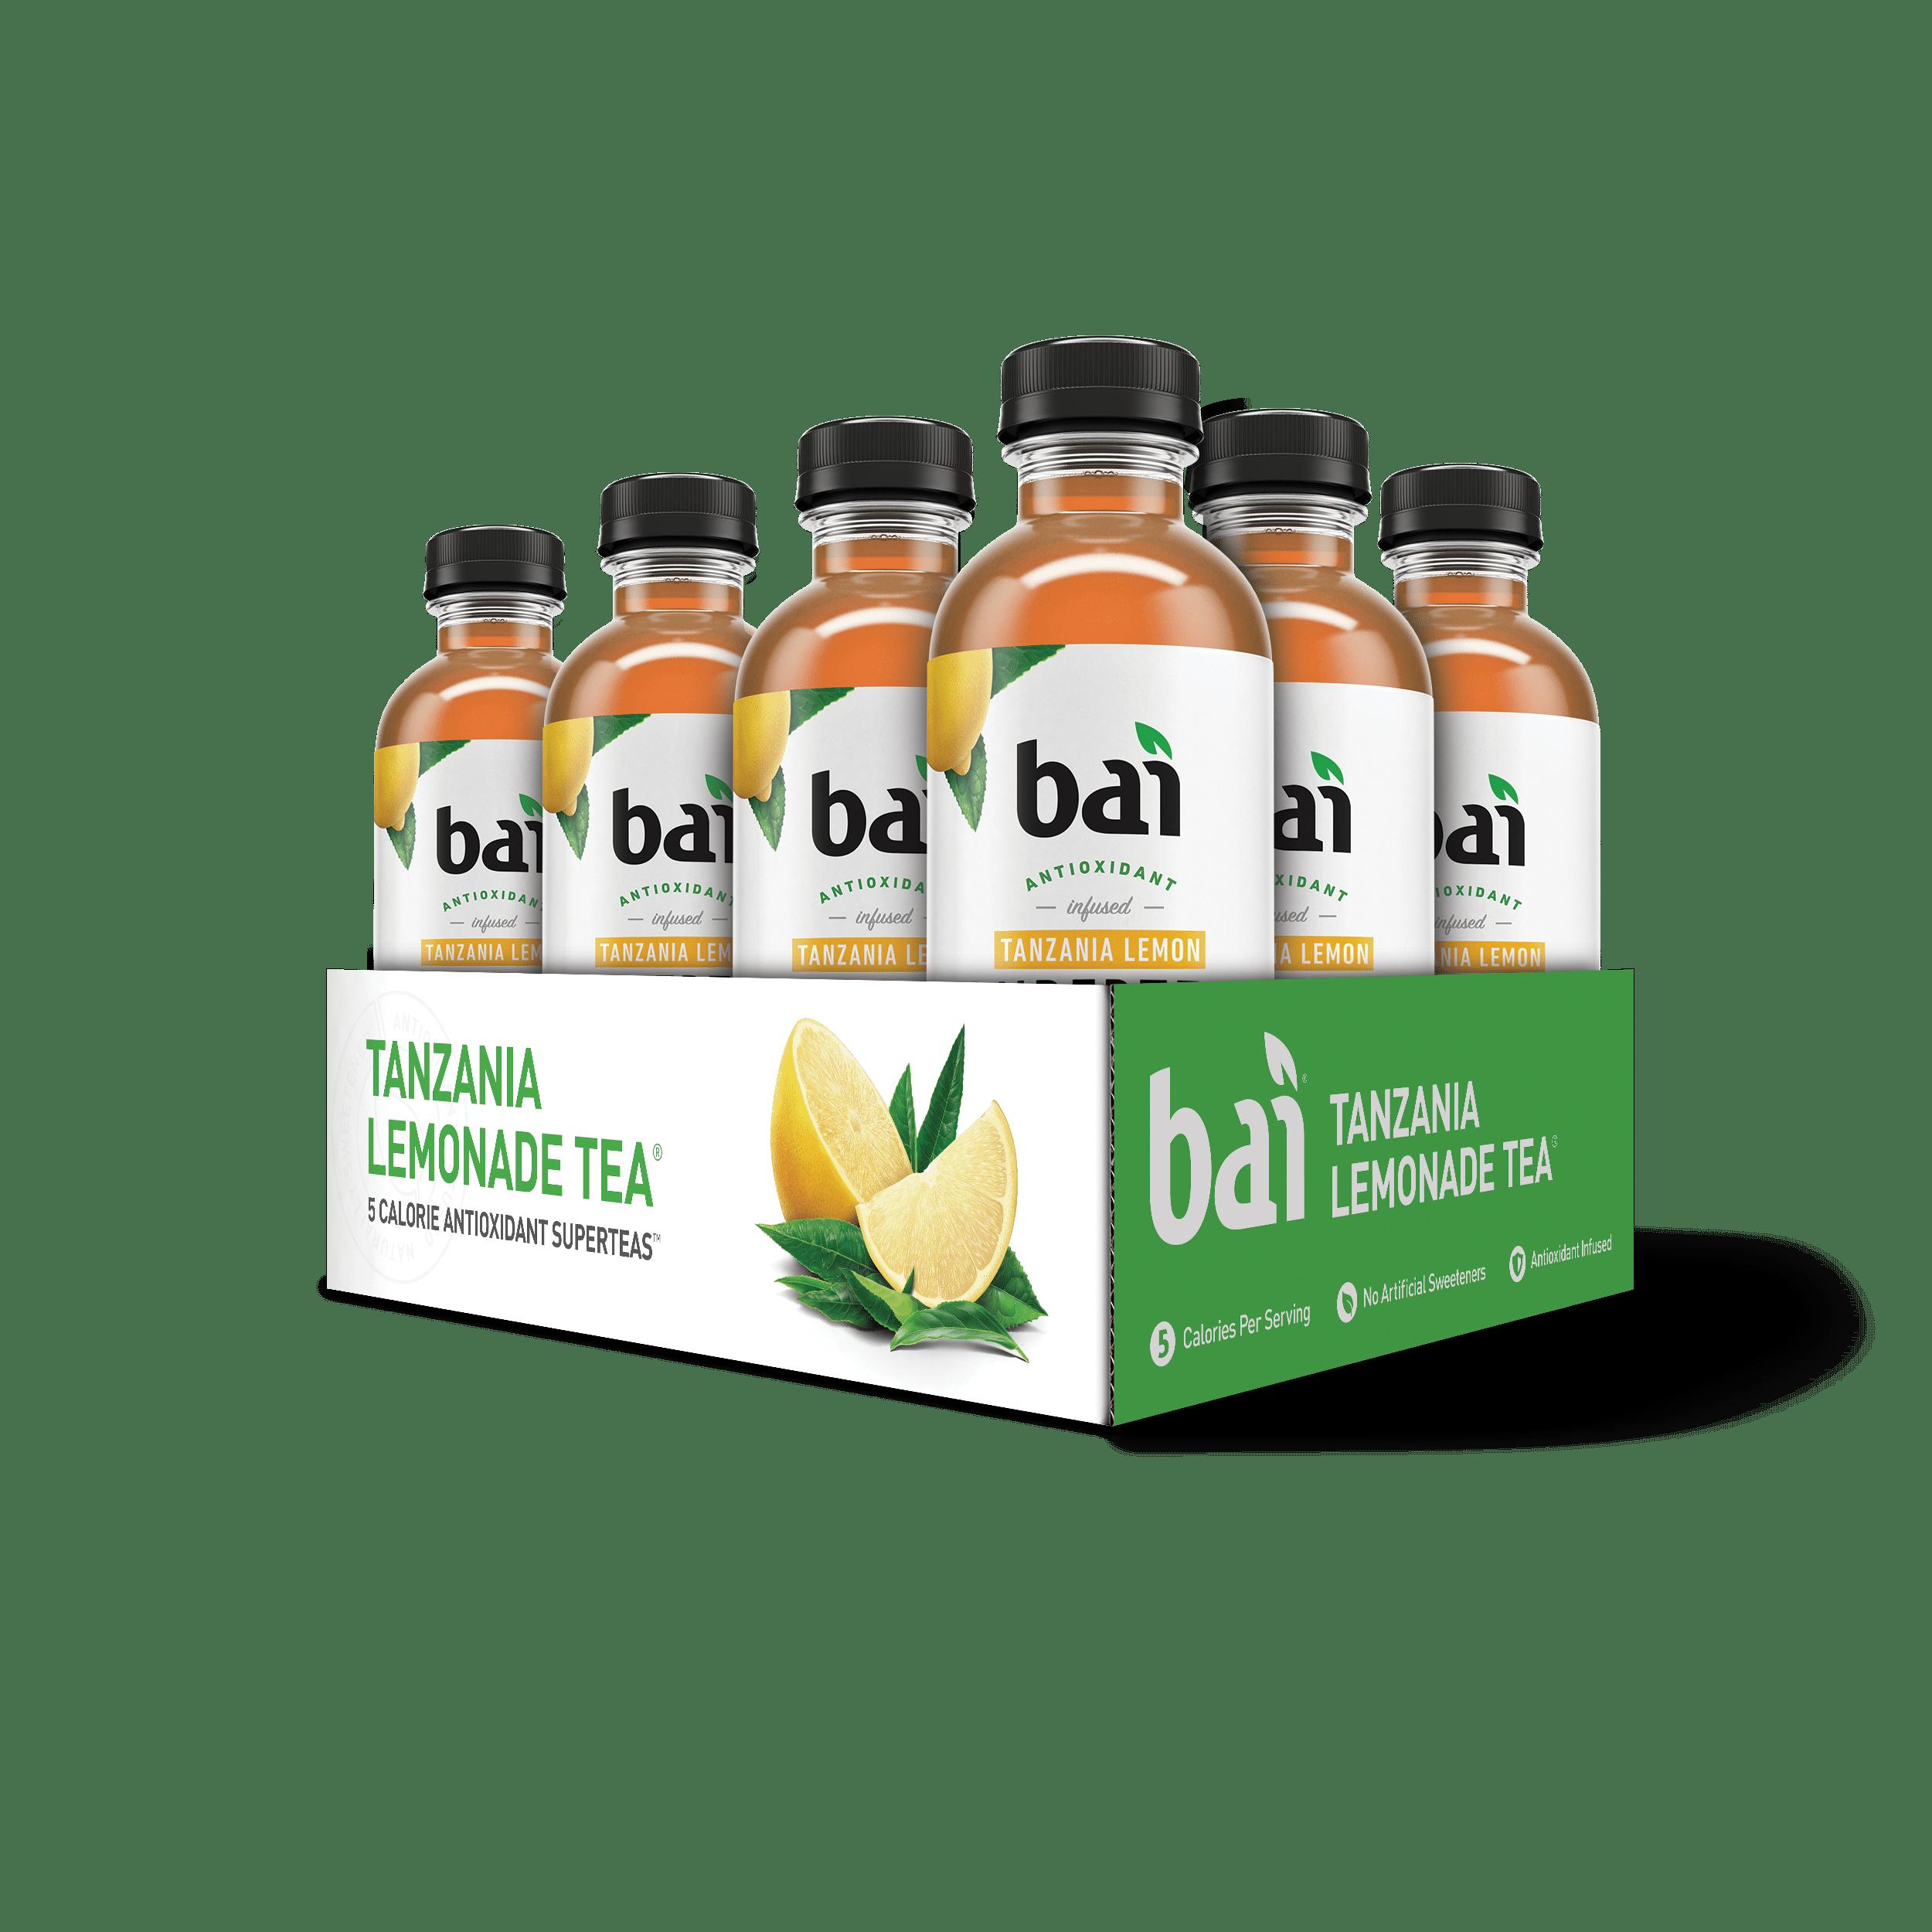 Bai Supertea Antioxidant Infused Beverage, Tanzania Lemonade, 18 Fl Oz, 12 Count